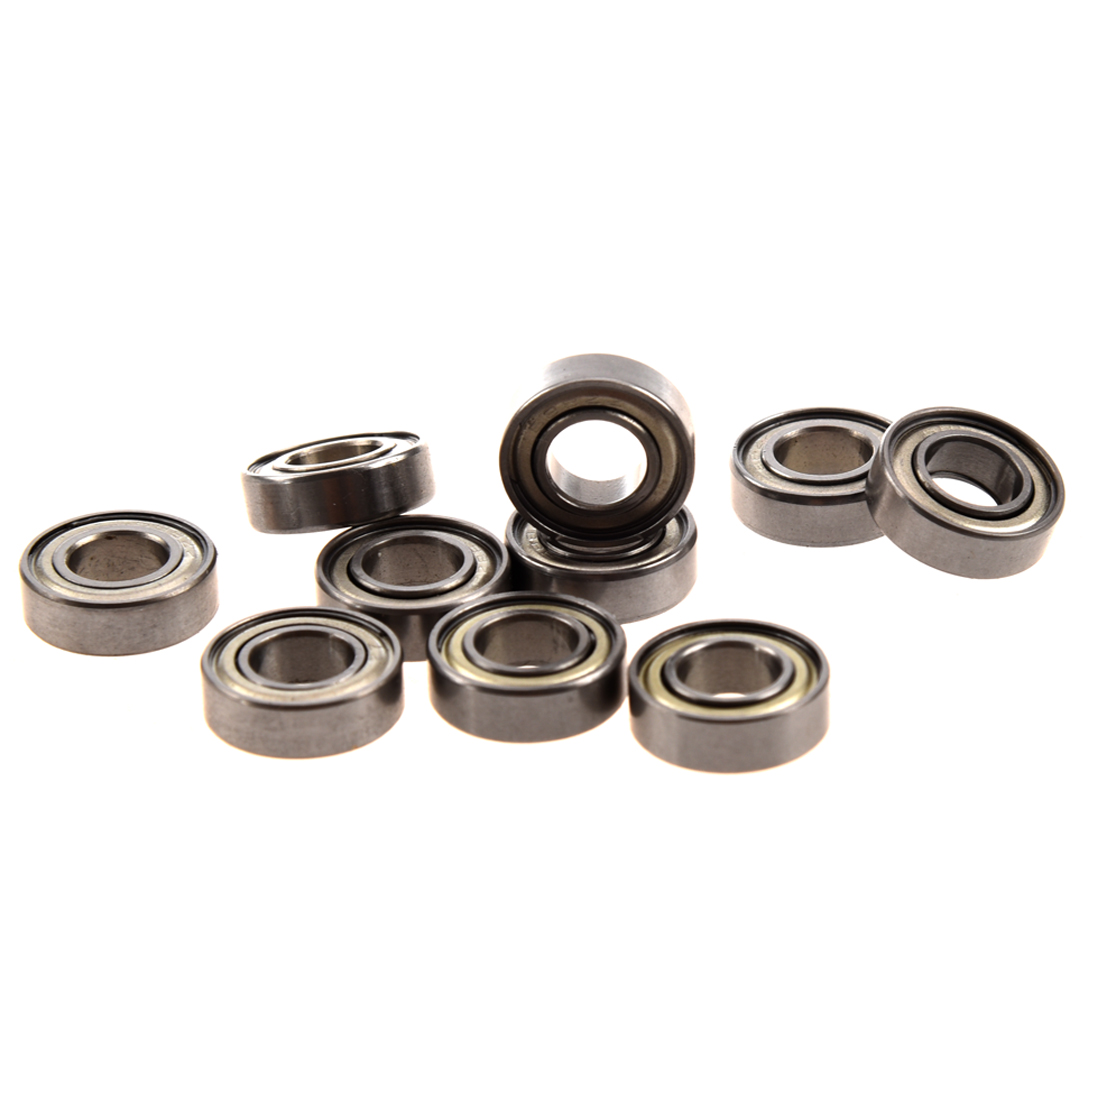 10 Pcs 698Z 8 x 19 x6mm Single Row Sealed Deep Groove Ball Bearings